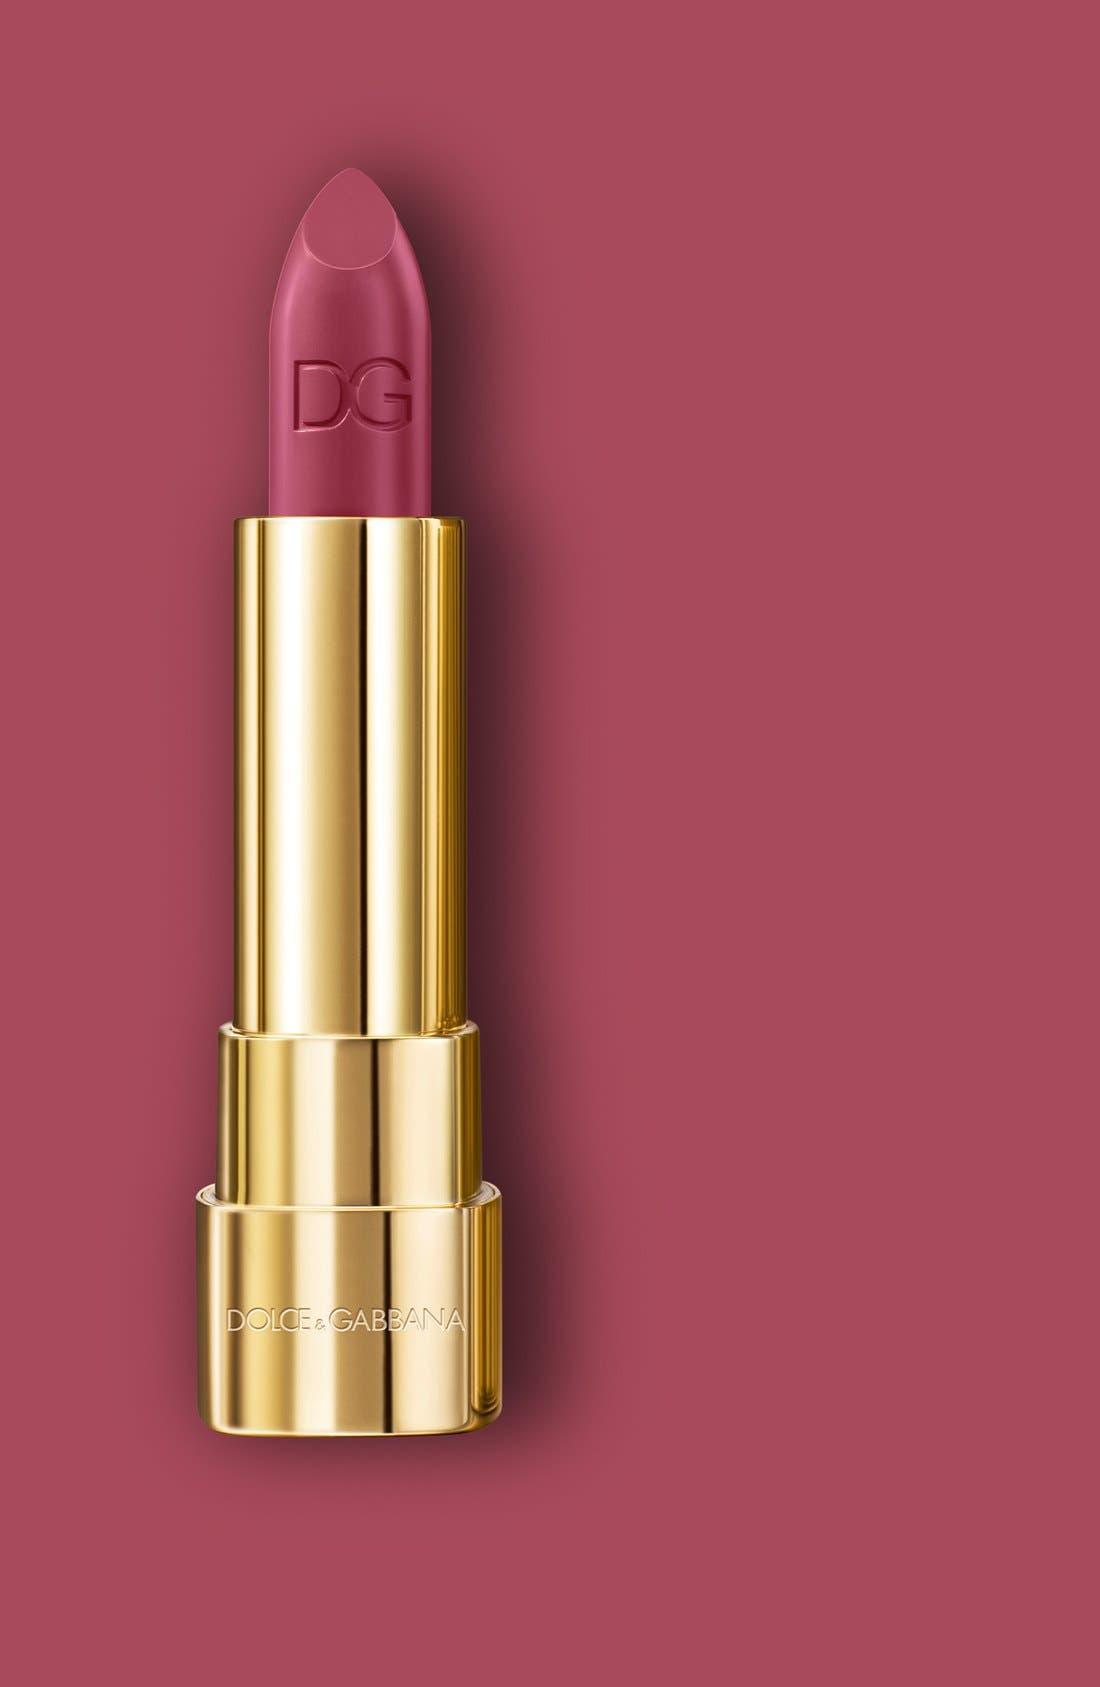 DOLCE&GABBANA BEAUTY,                             Dolce&GabbanaBeauty 'Shine -Sophia Loren N°1' Lipstick,                             Alternate thumbnail 3, color,                             600